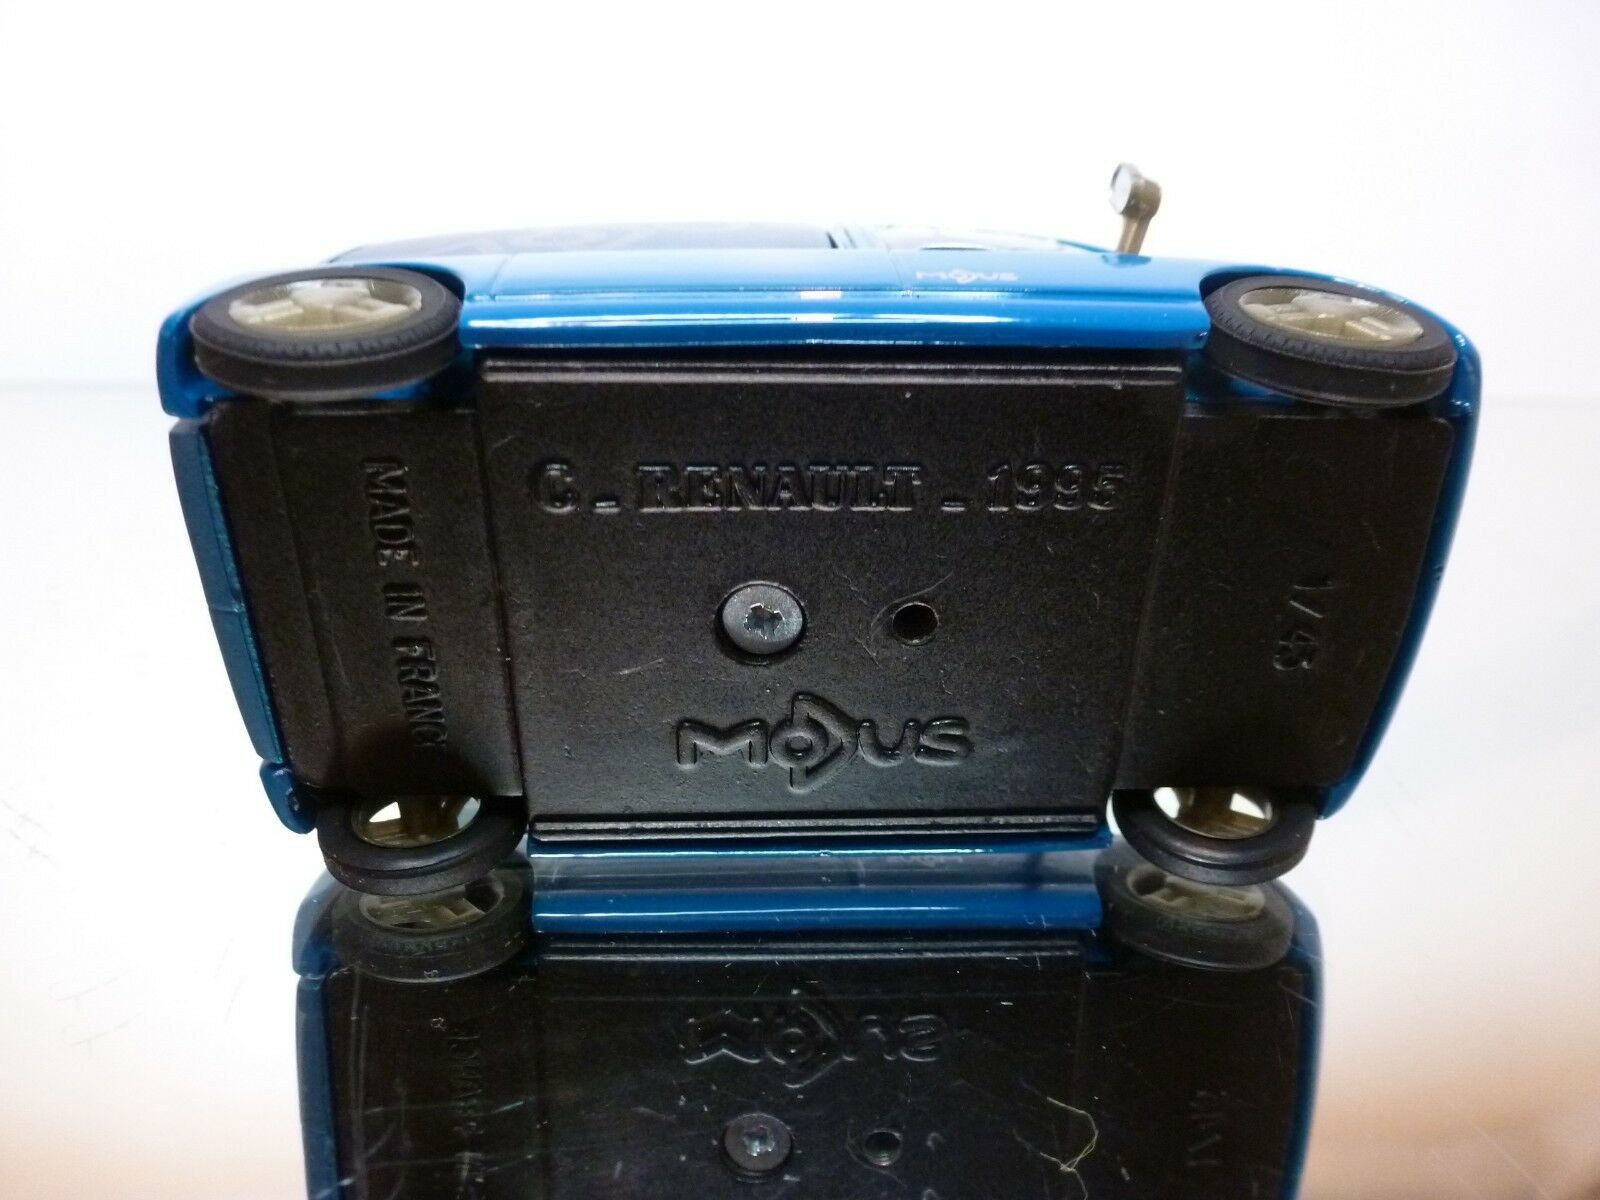 AQUAVIT RESIN C-RENAULT 1995 MODUS - blueE METALLIC METALLIC METALLIC 1 43 - EXCELLENT CONDITION 4 7ba0db